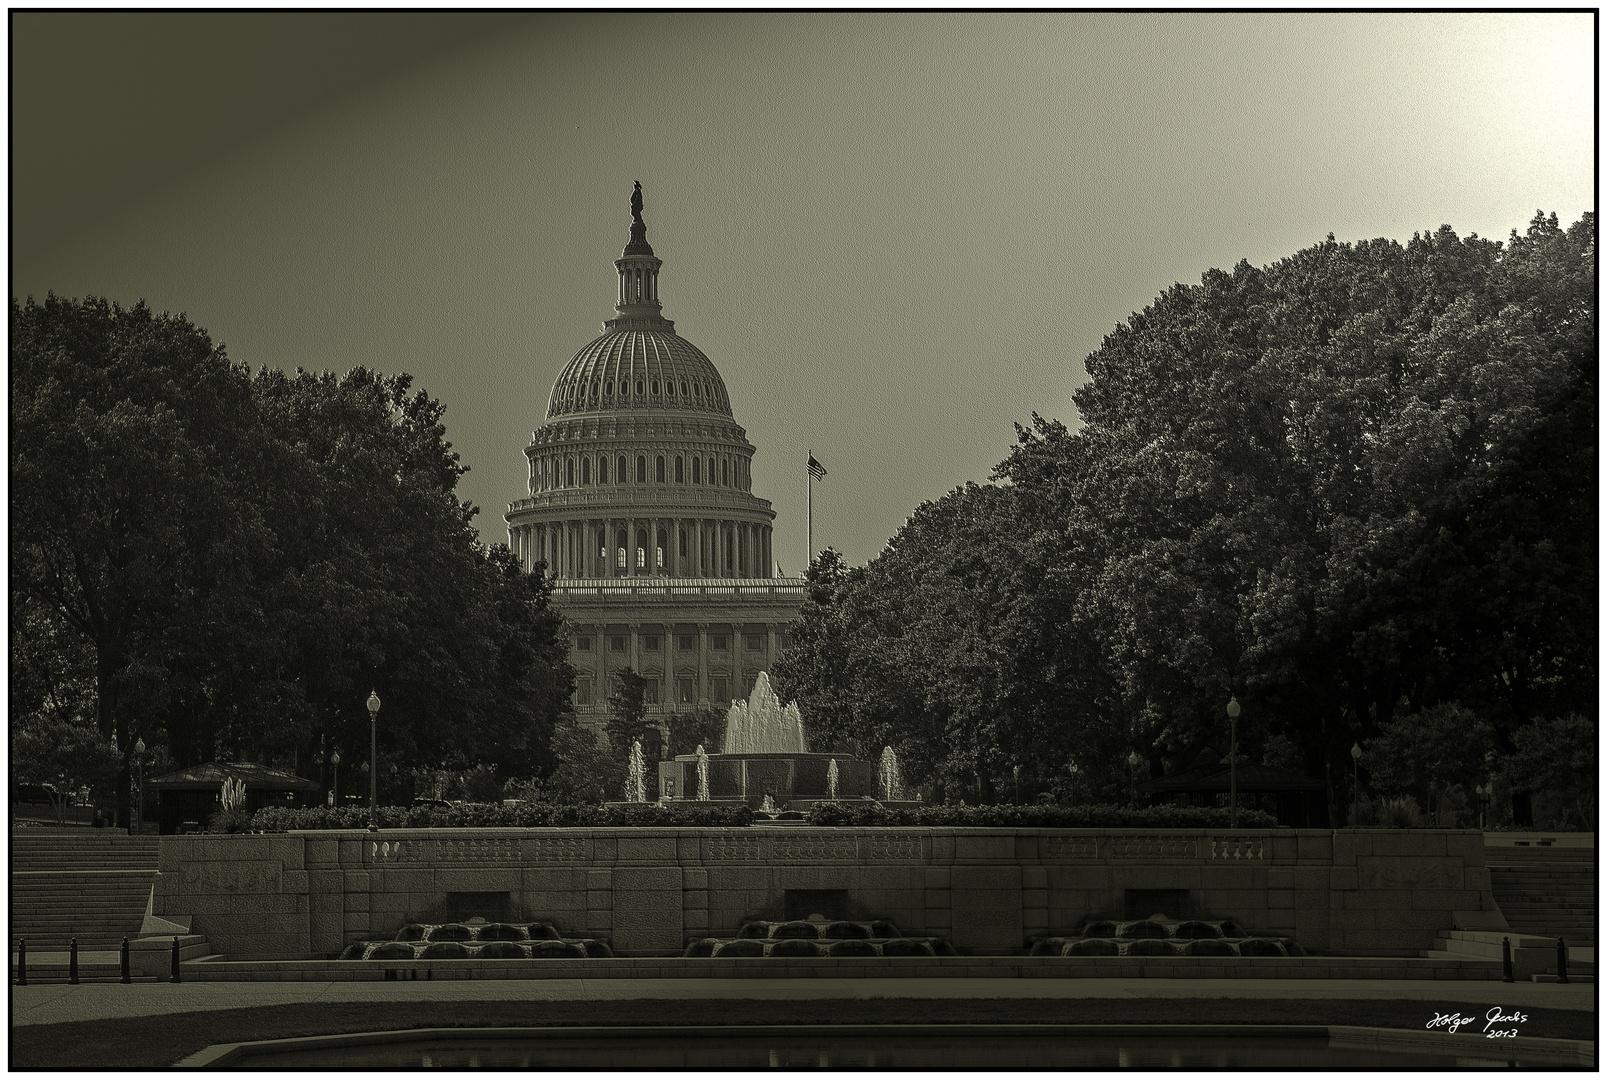 The CAPITOL Washington D.C.